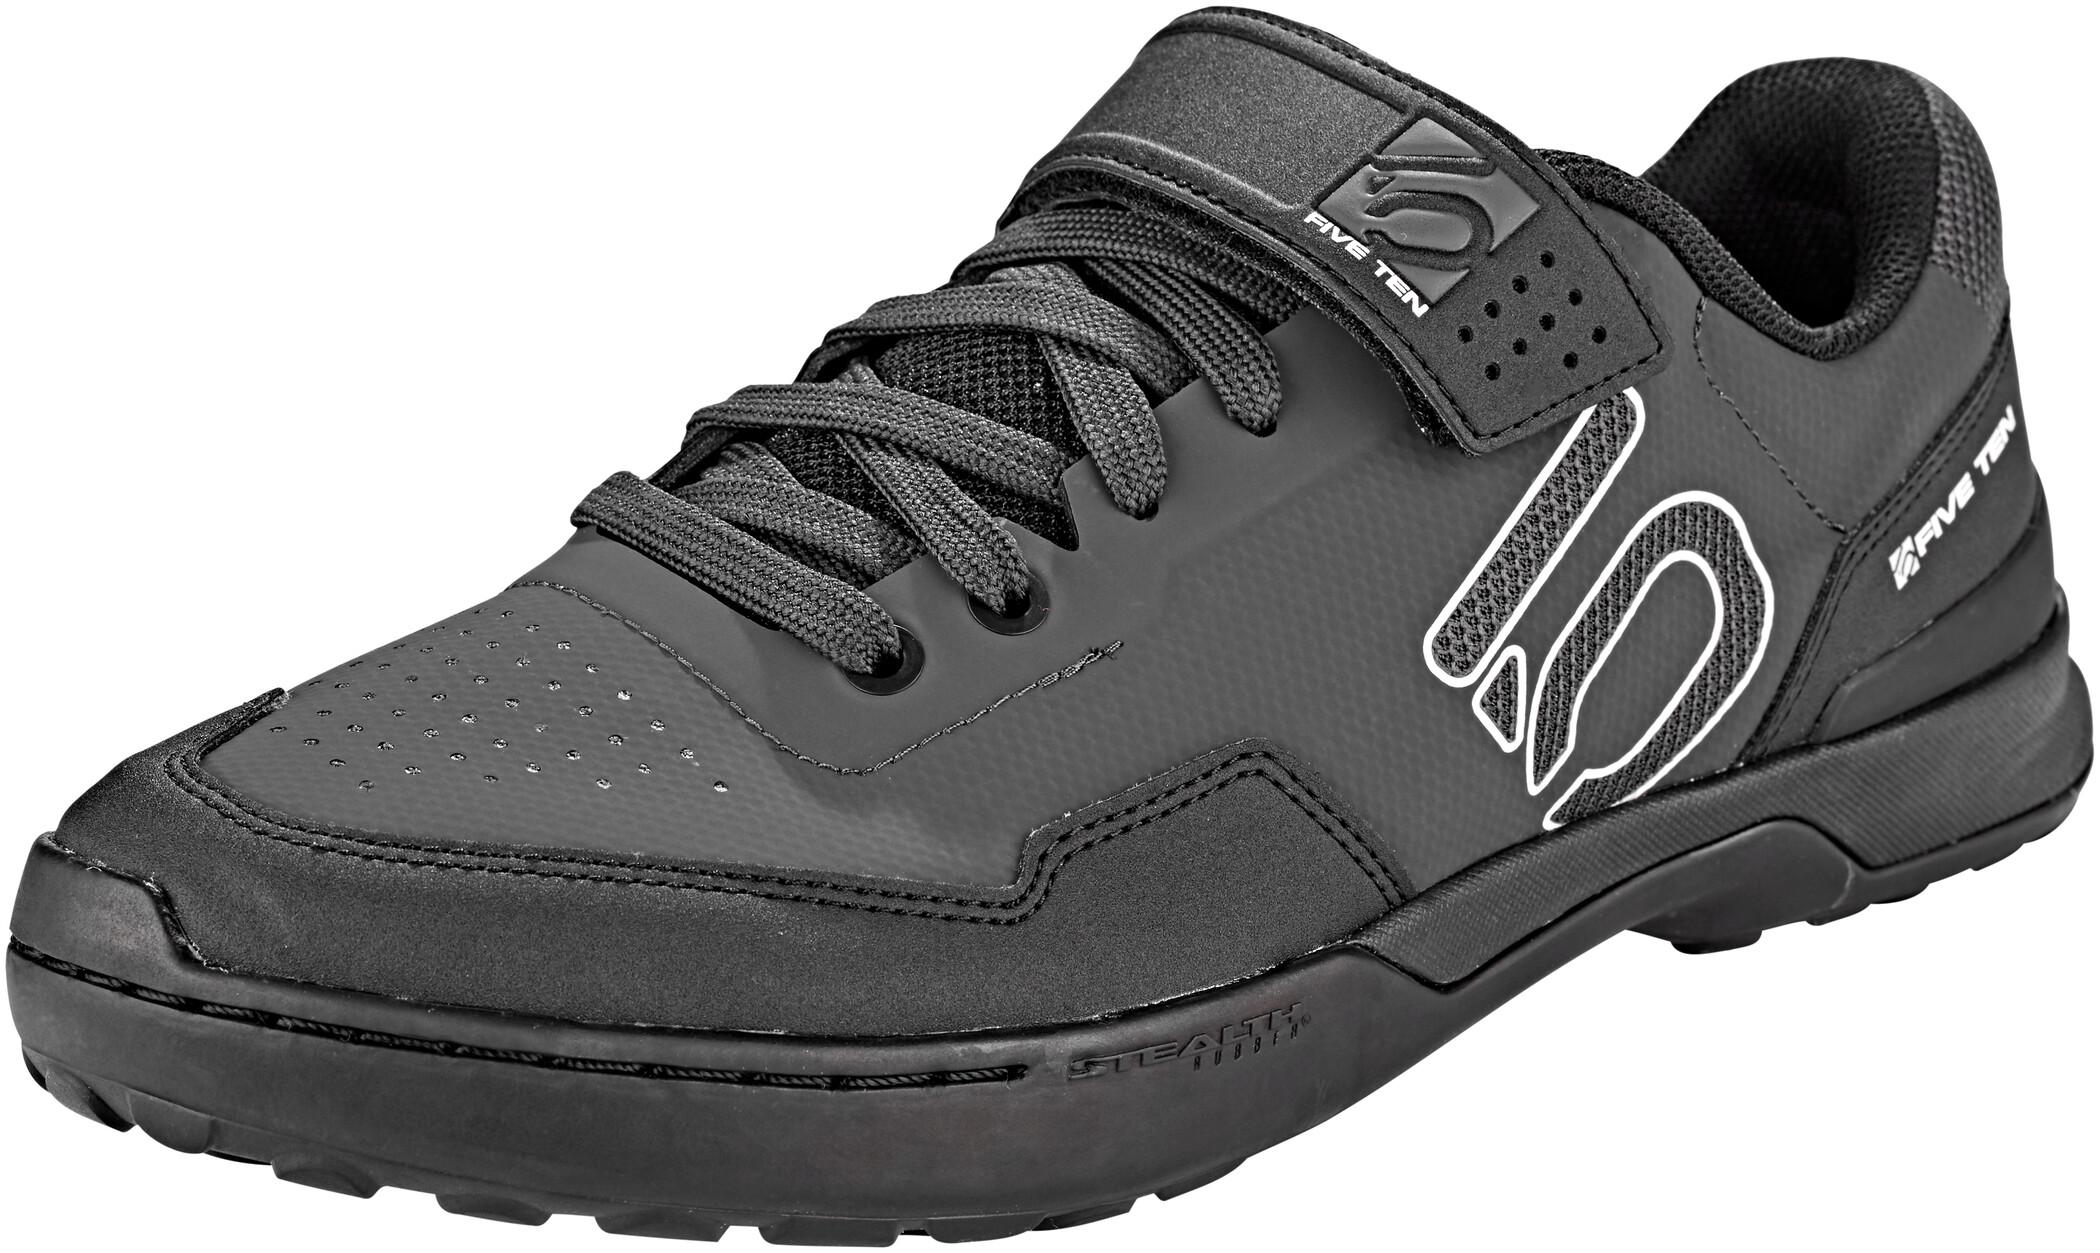 adidas Five Ten 5.10 Kestrel Lace Sko Herrer, carbon/core black/clgrey (2020) | Shoes